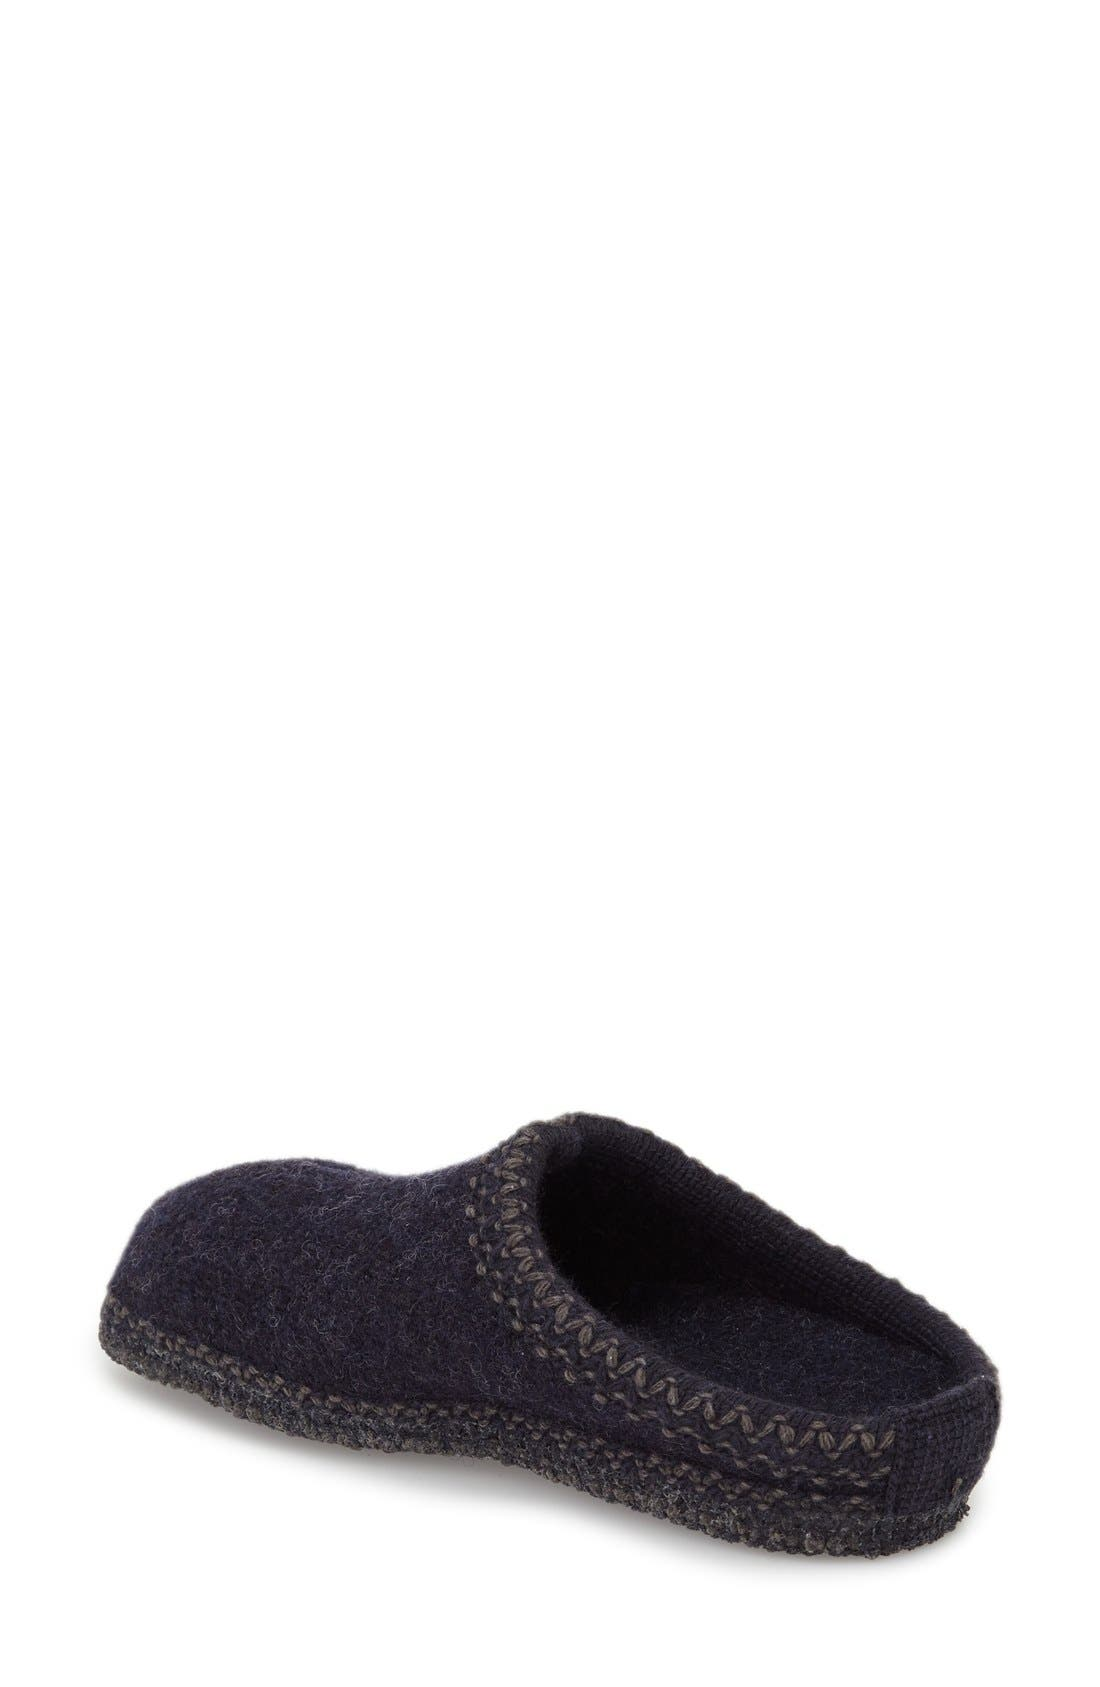 'Classic' Slipper,                             Alternate thumbnail 2, color,                             Navy Wool